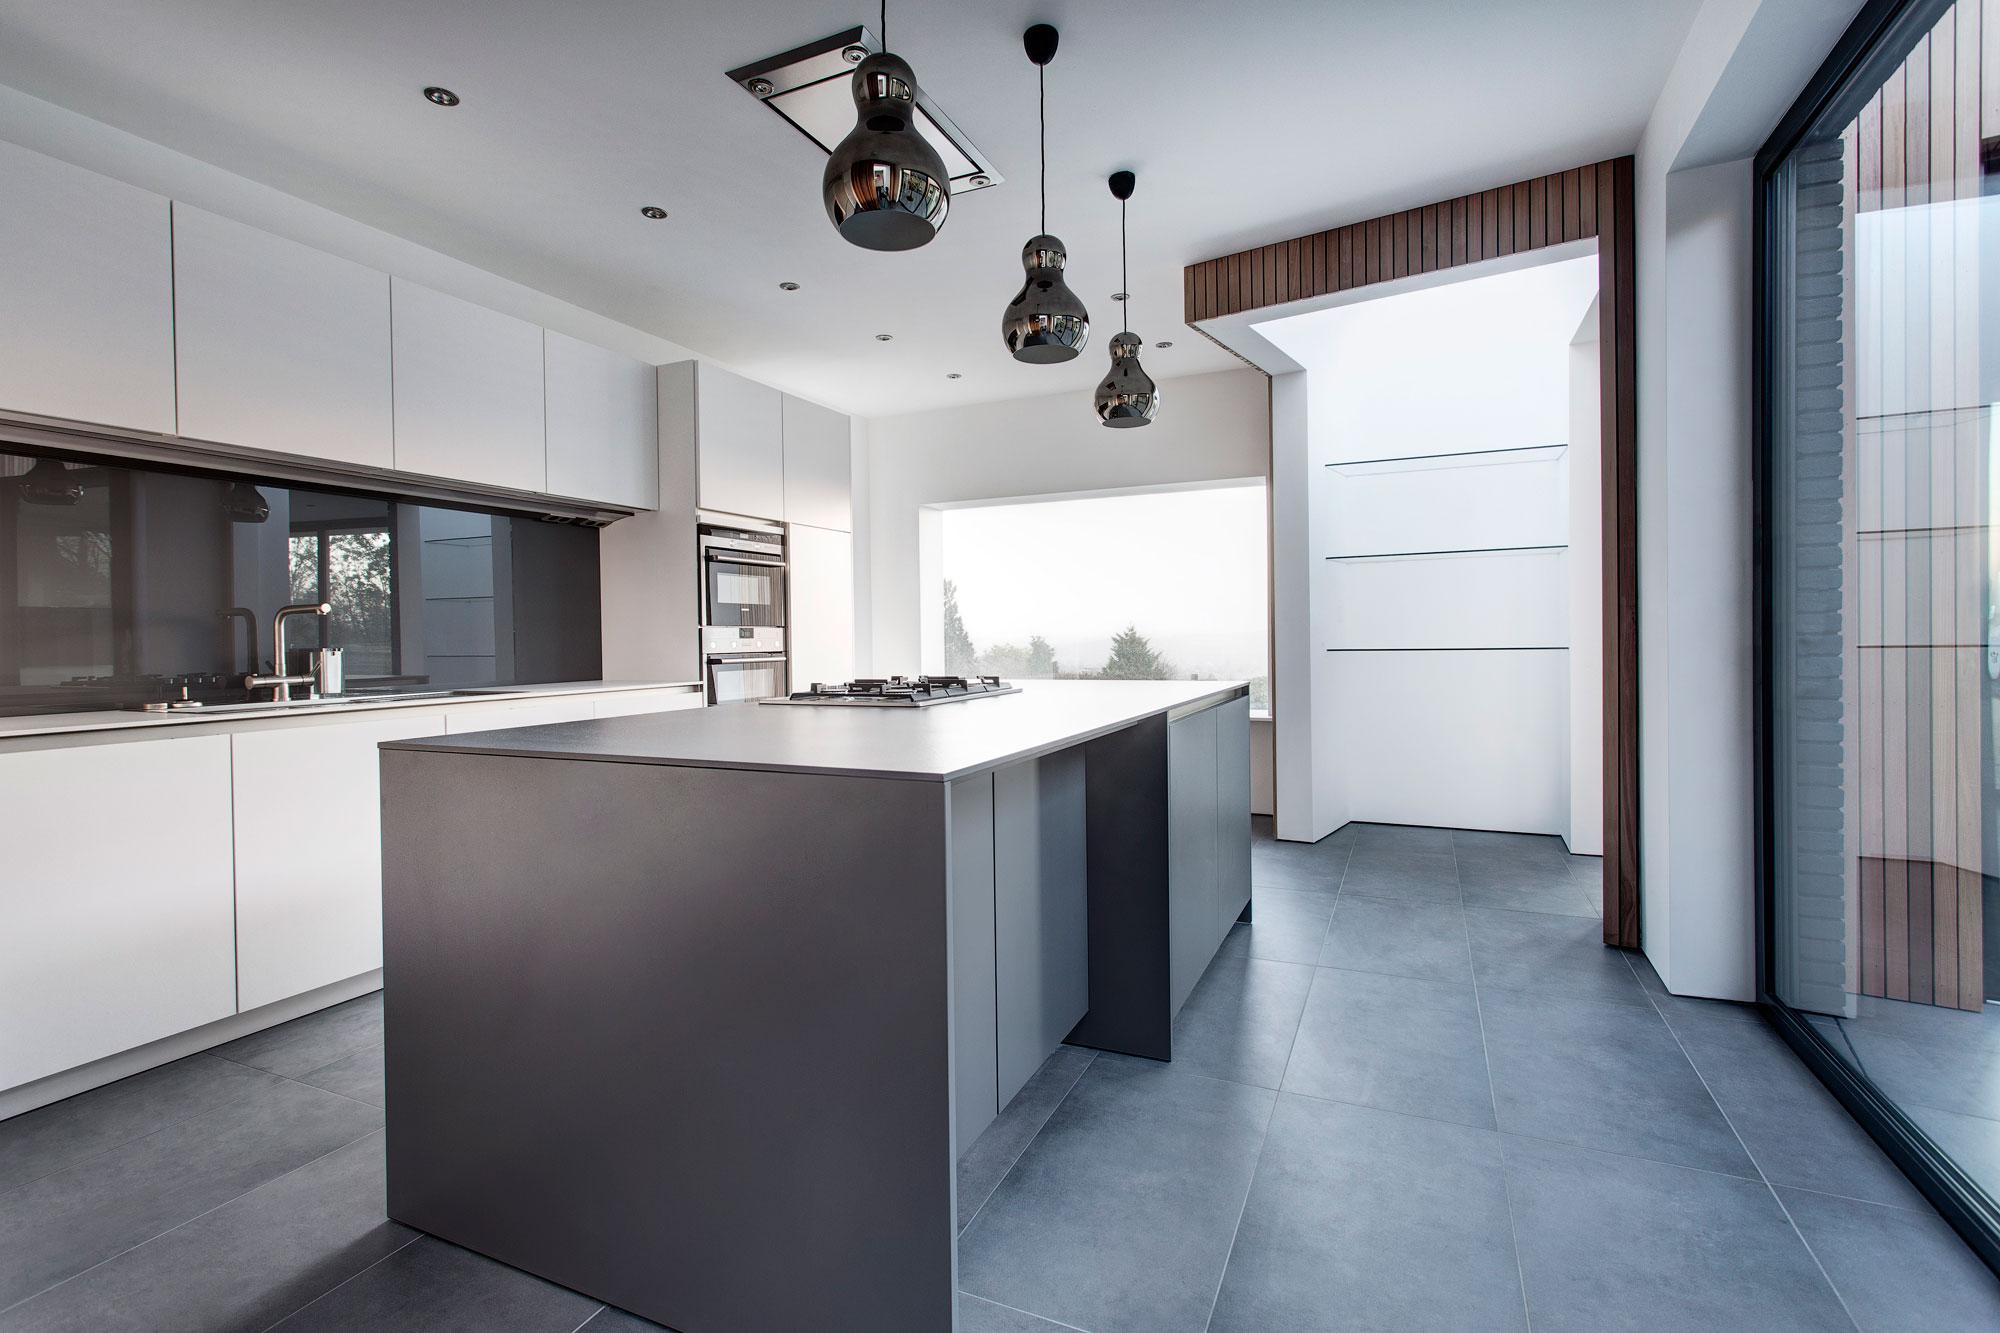 White & Grey Kitchen, Island, Pendant Lighting, Modern ...